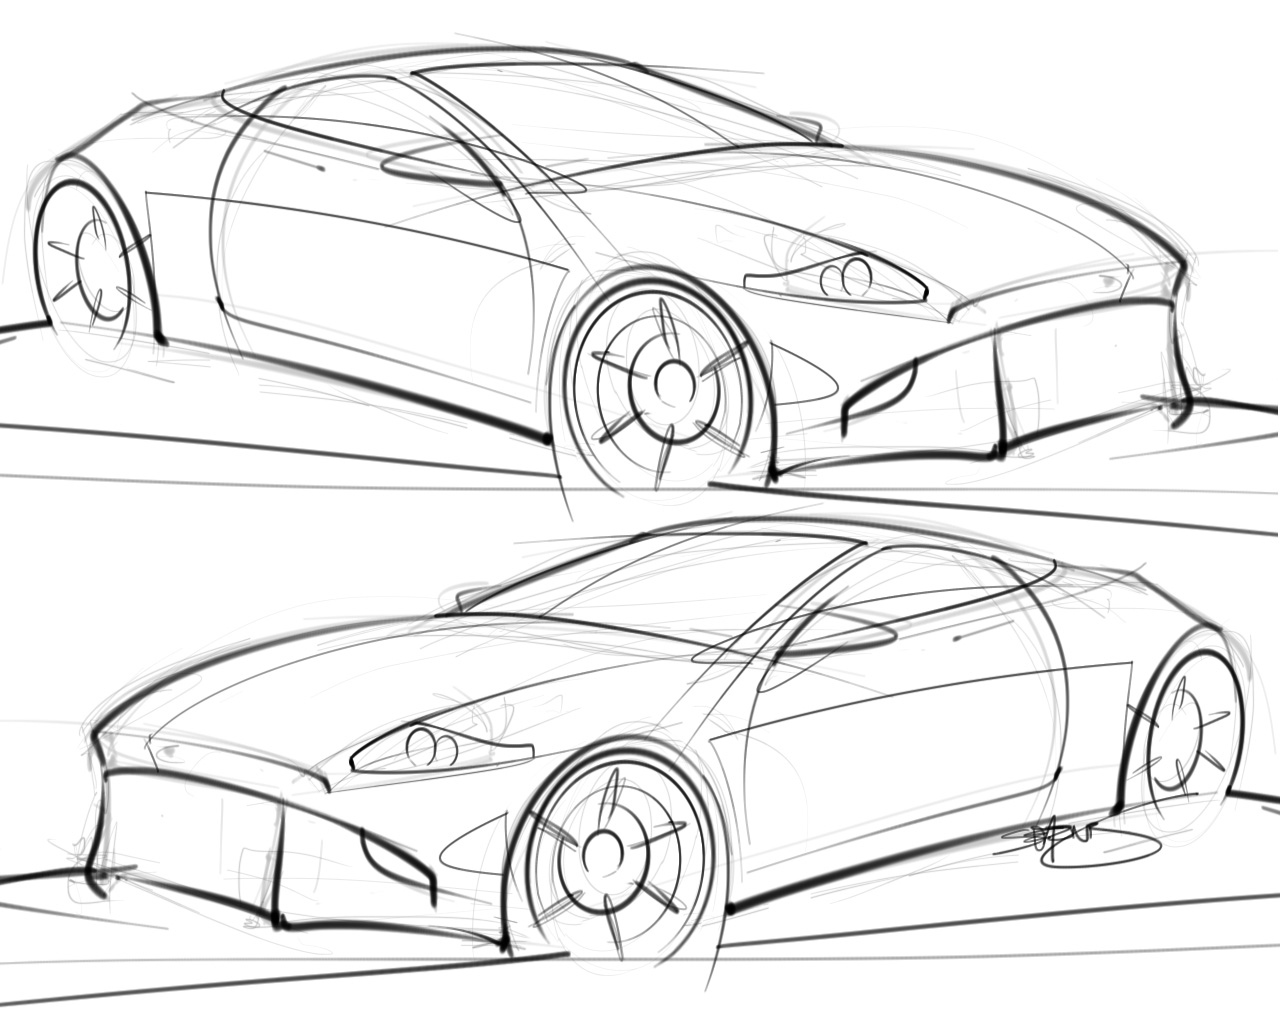 Motor Drawing At Getdrawings